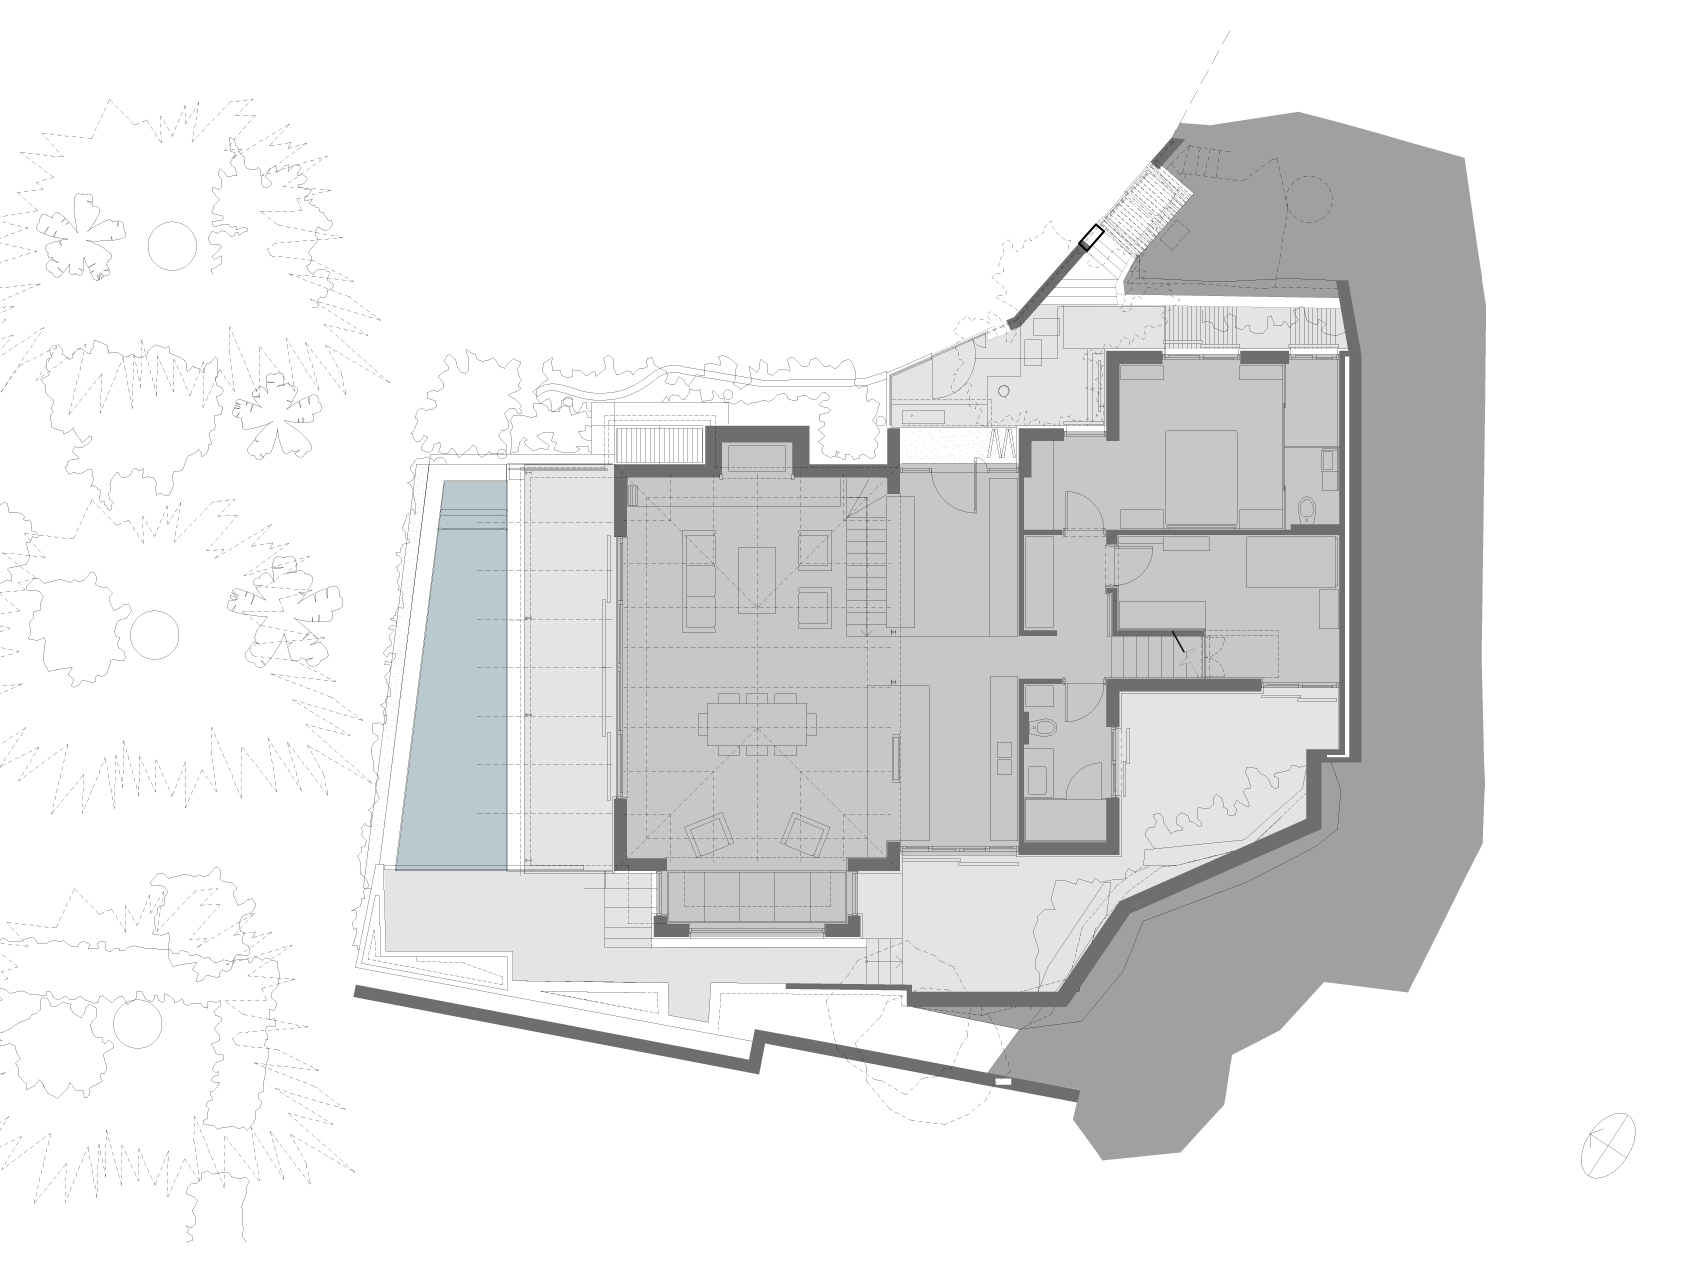 CLIFTON BEACH HOUSE 3 plan